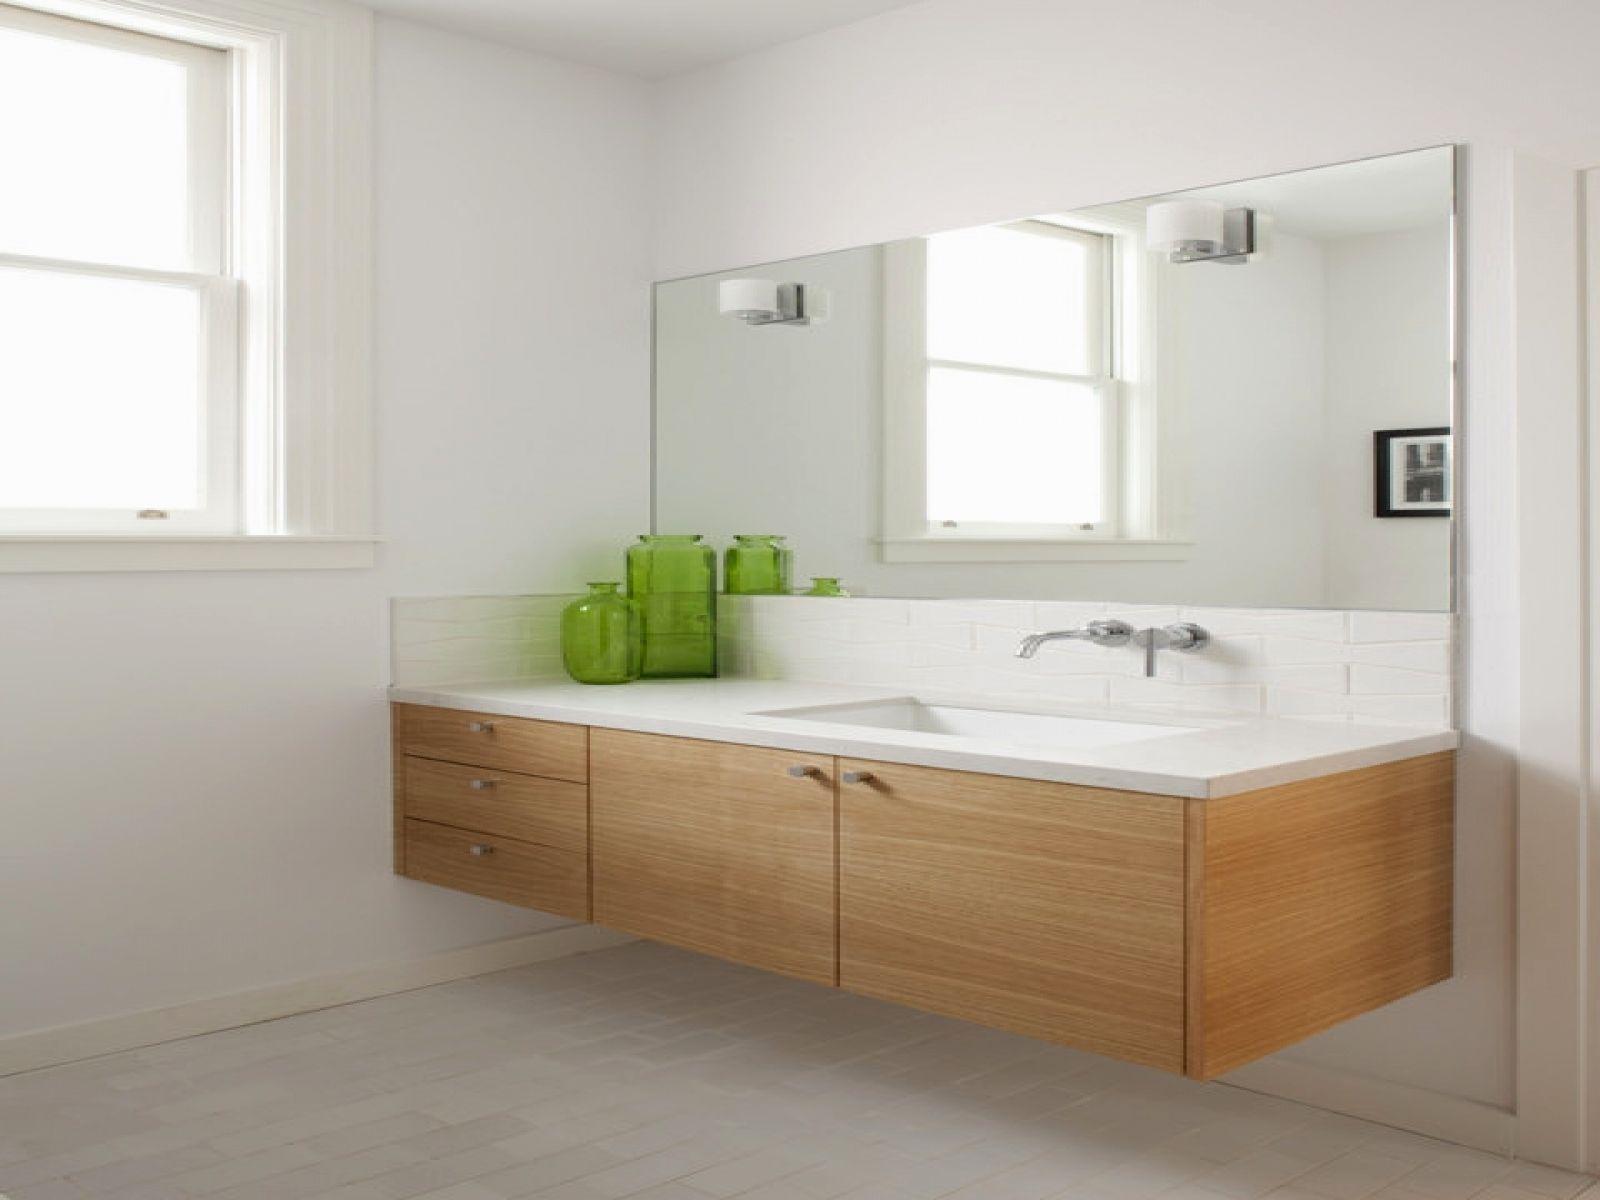 contemporary undermount bathroom sinks construction-New Undermount Bathroom Sinks Construction